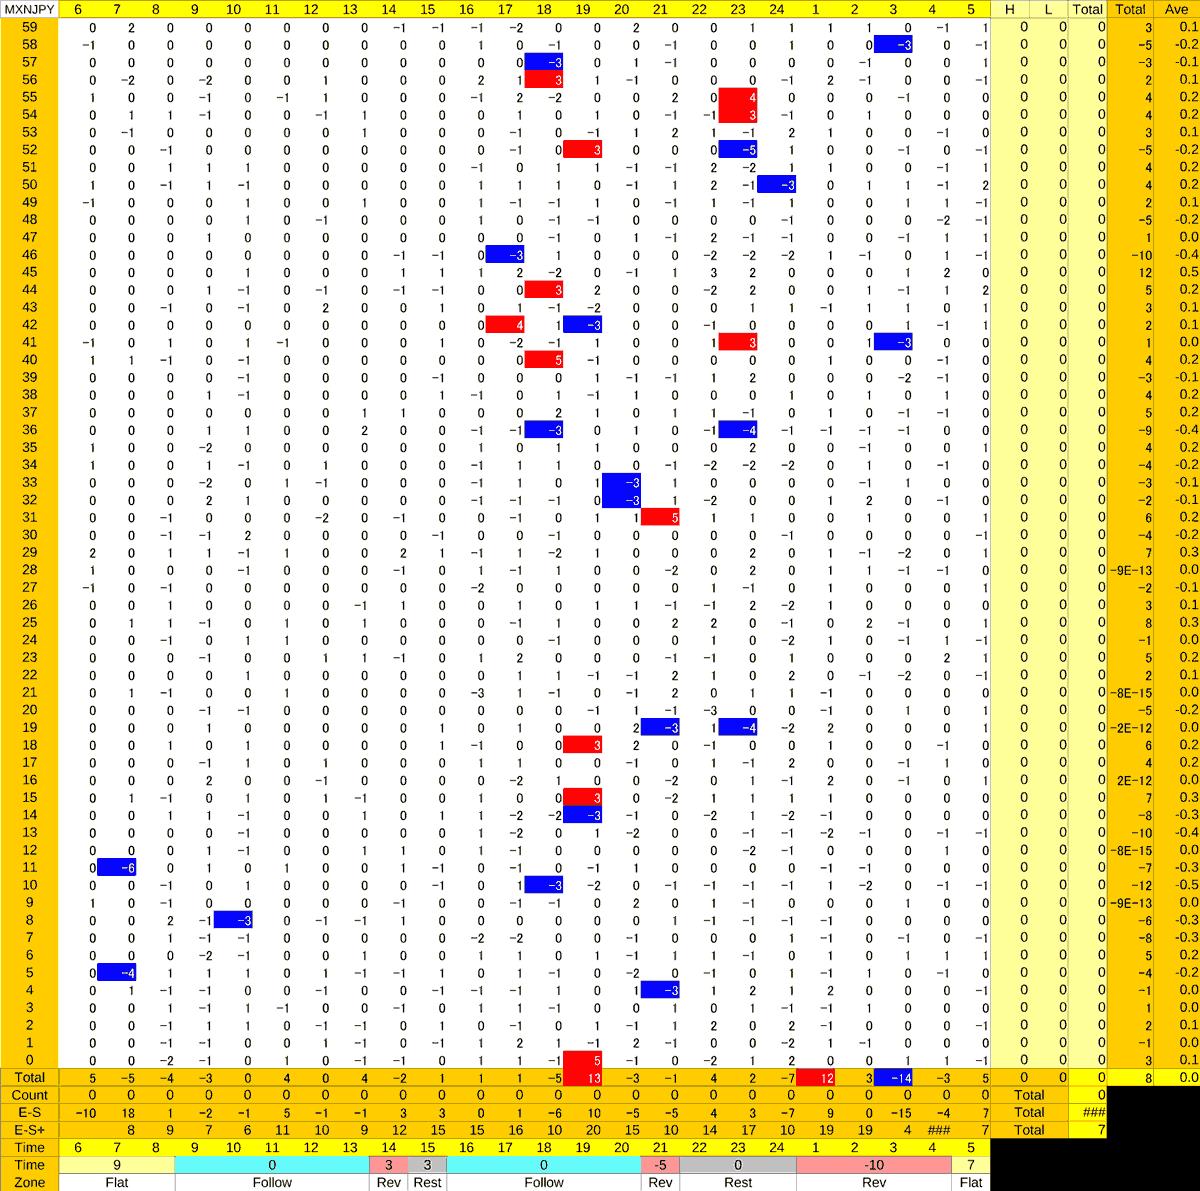 20210120_HS(3)MXNJPY